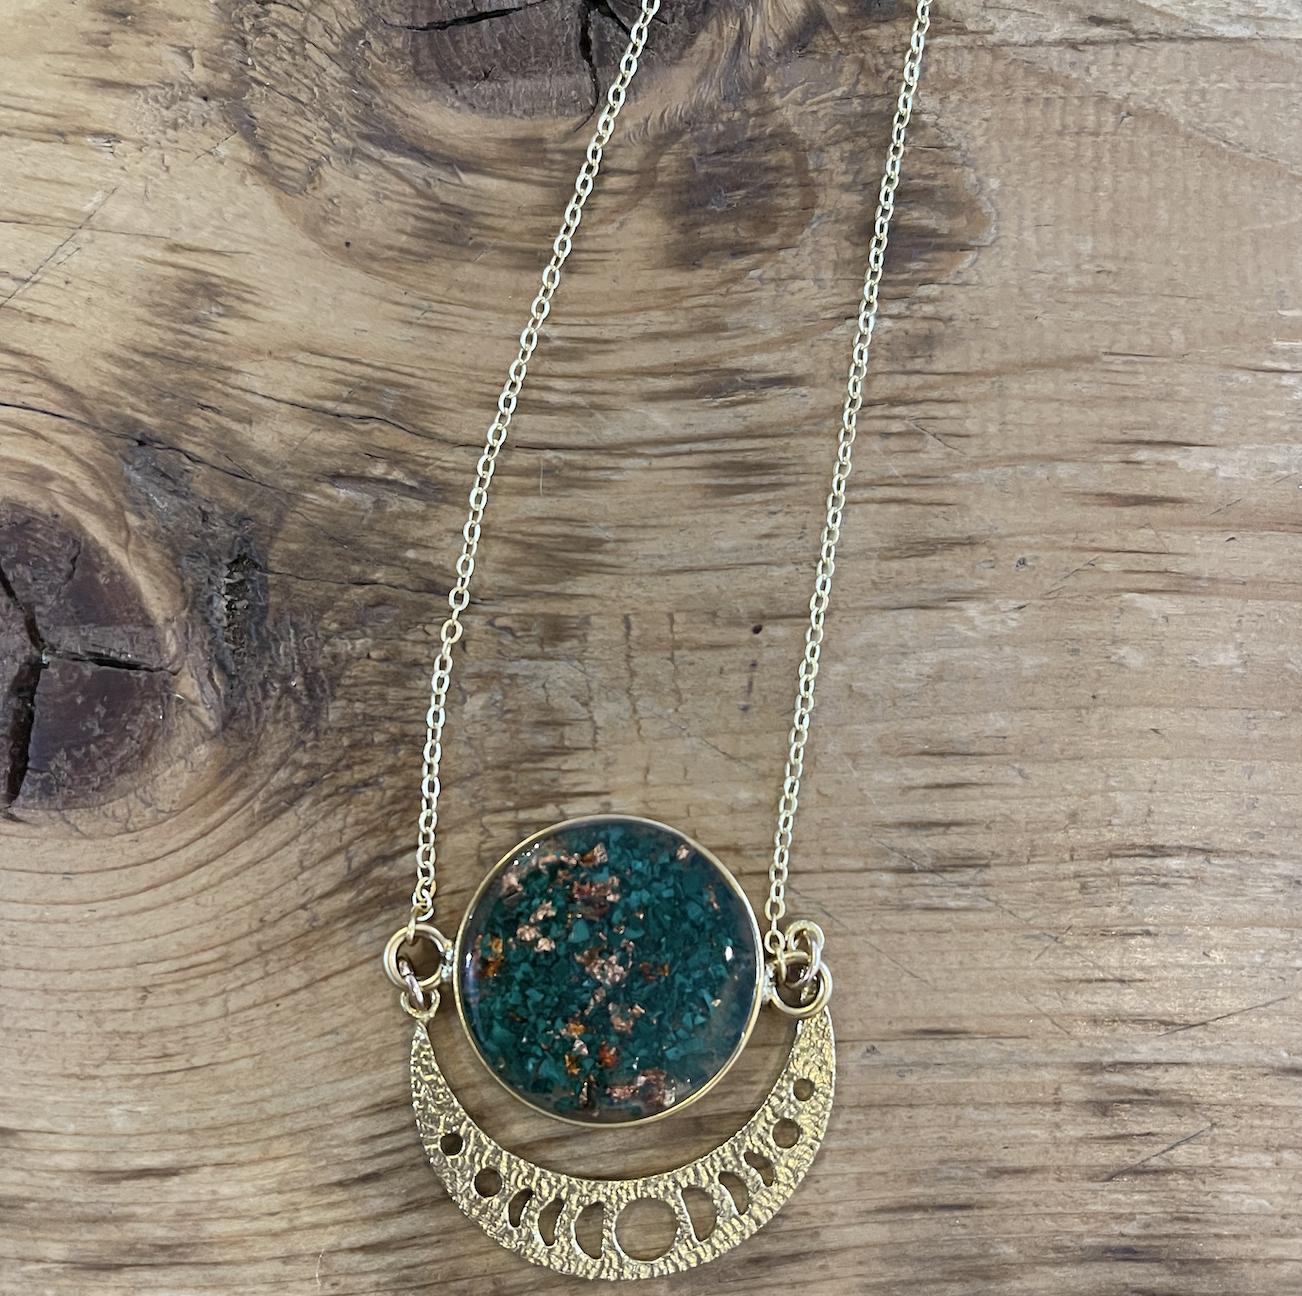 Cameoko Moonphase Starburst Necklace-coral + gold flake